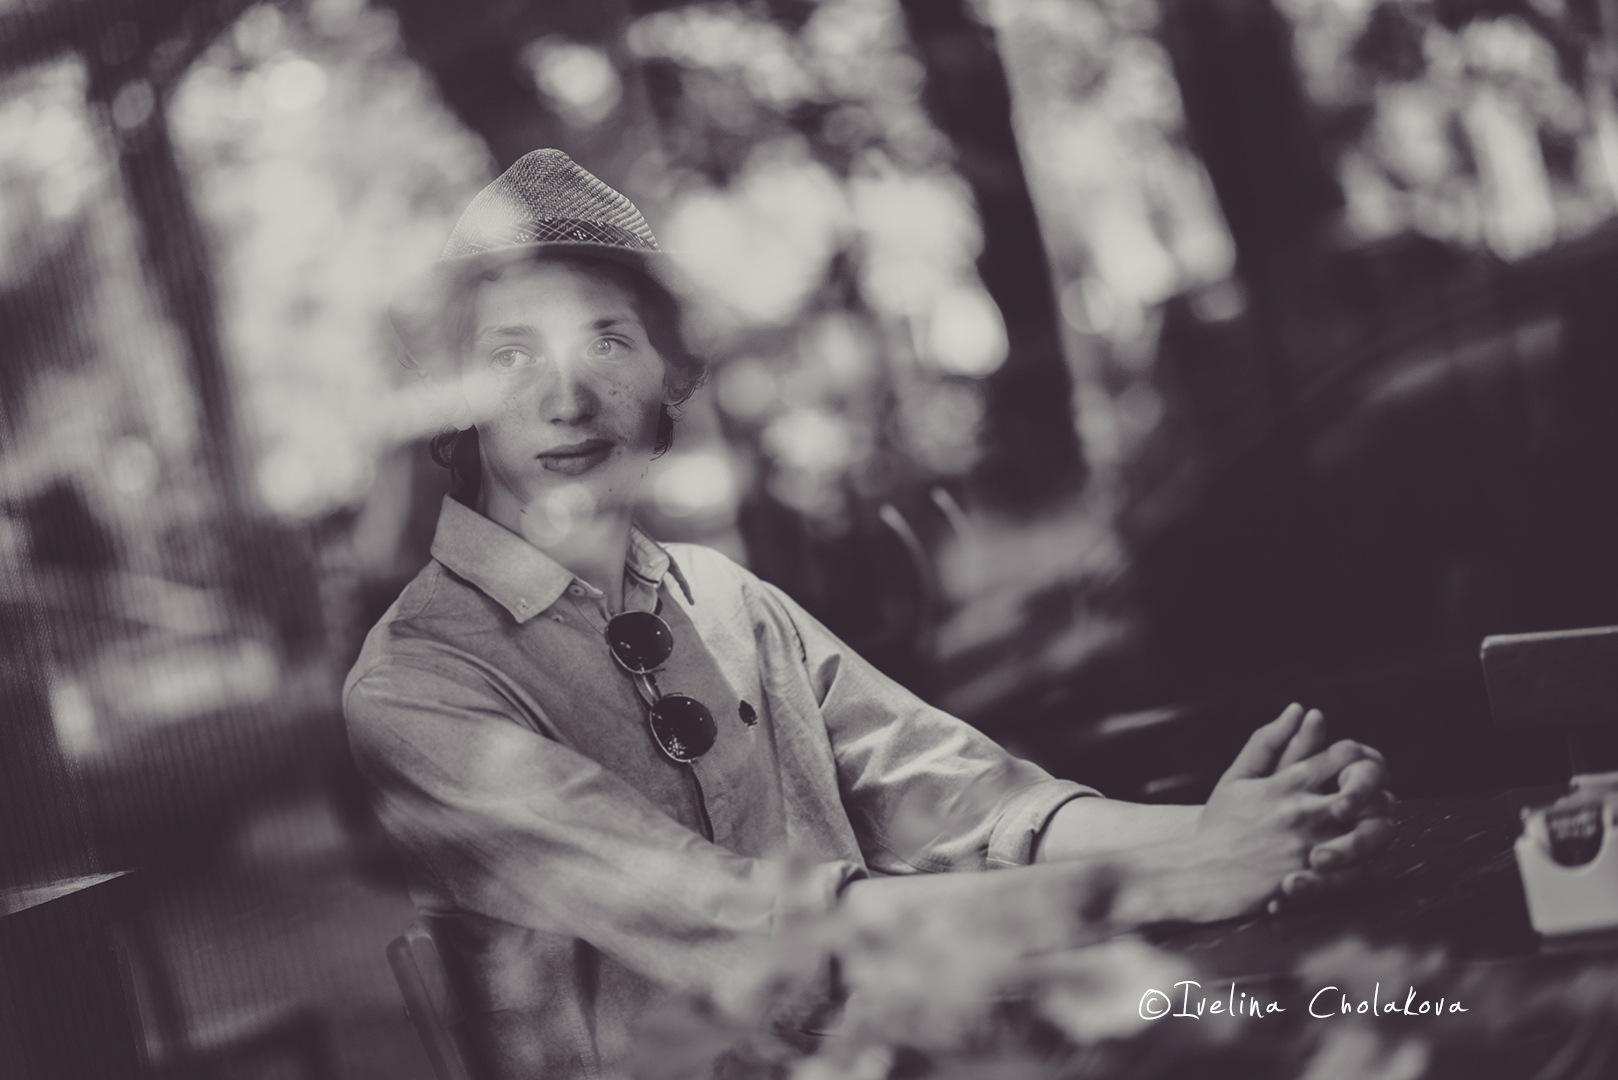 Stranger by Ivelina Cholakova